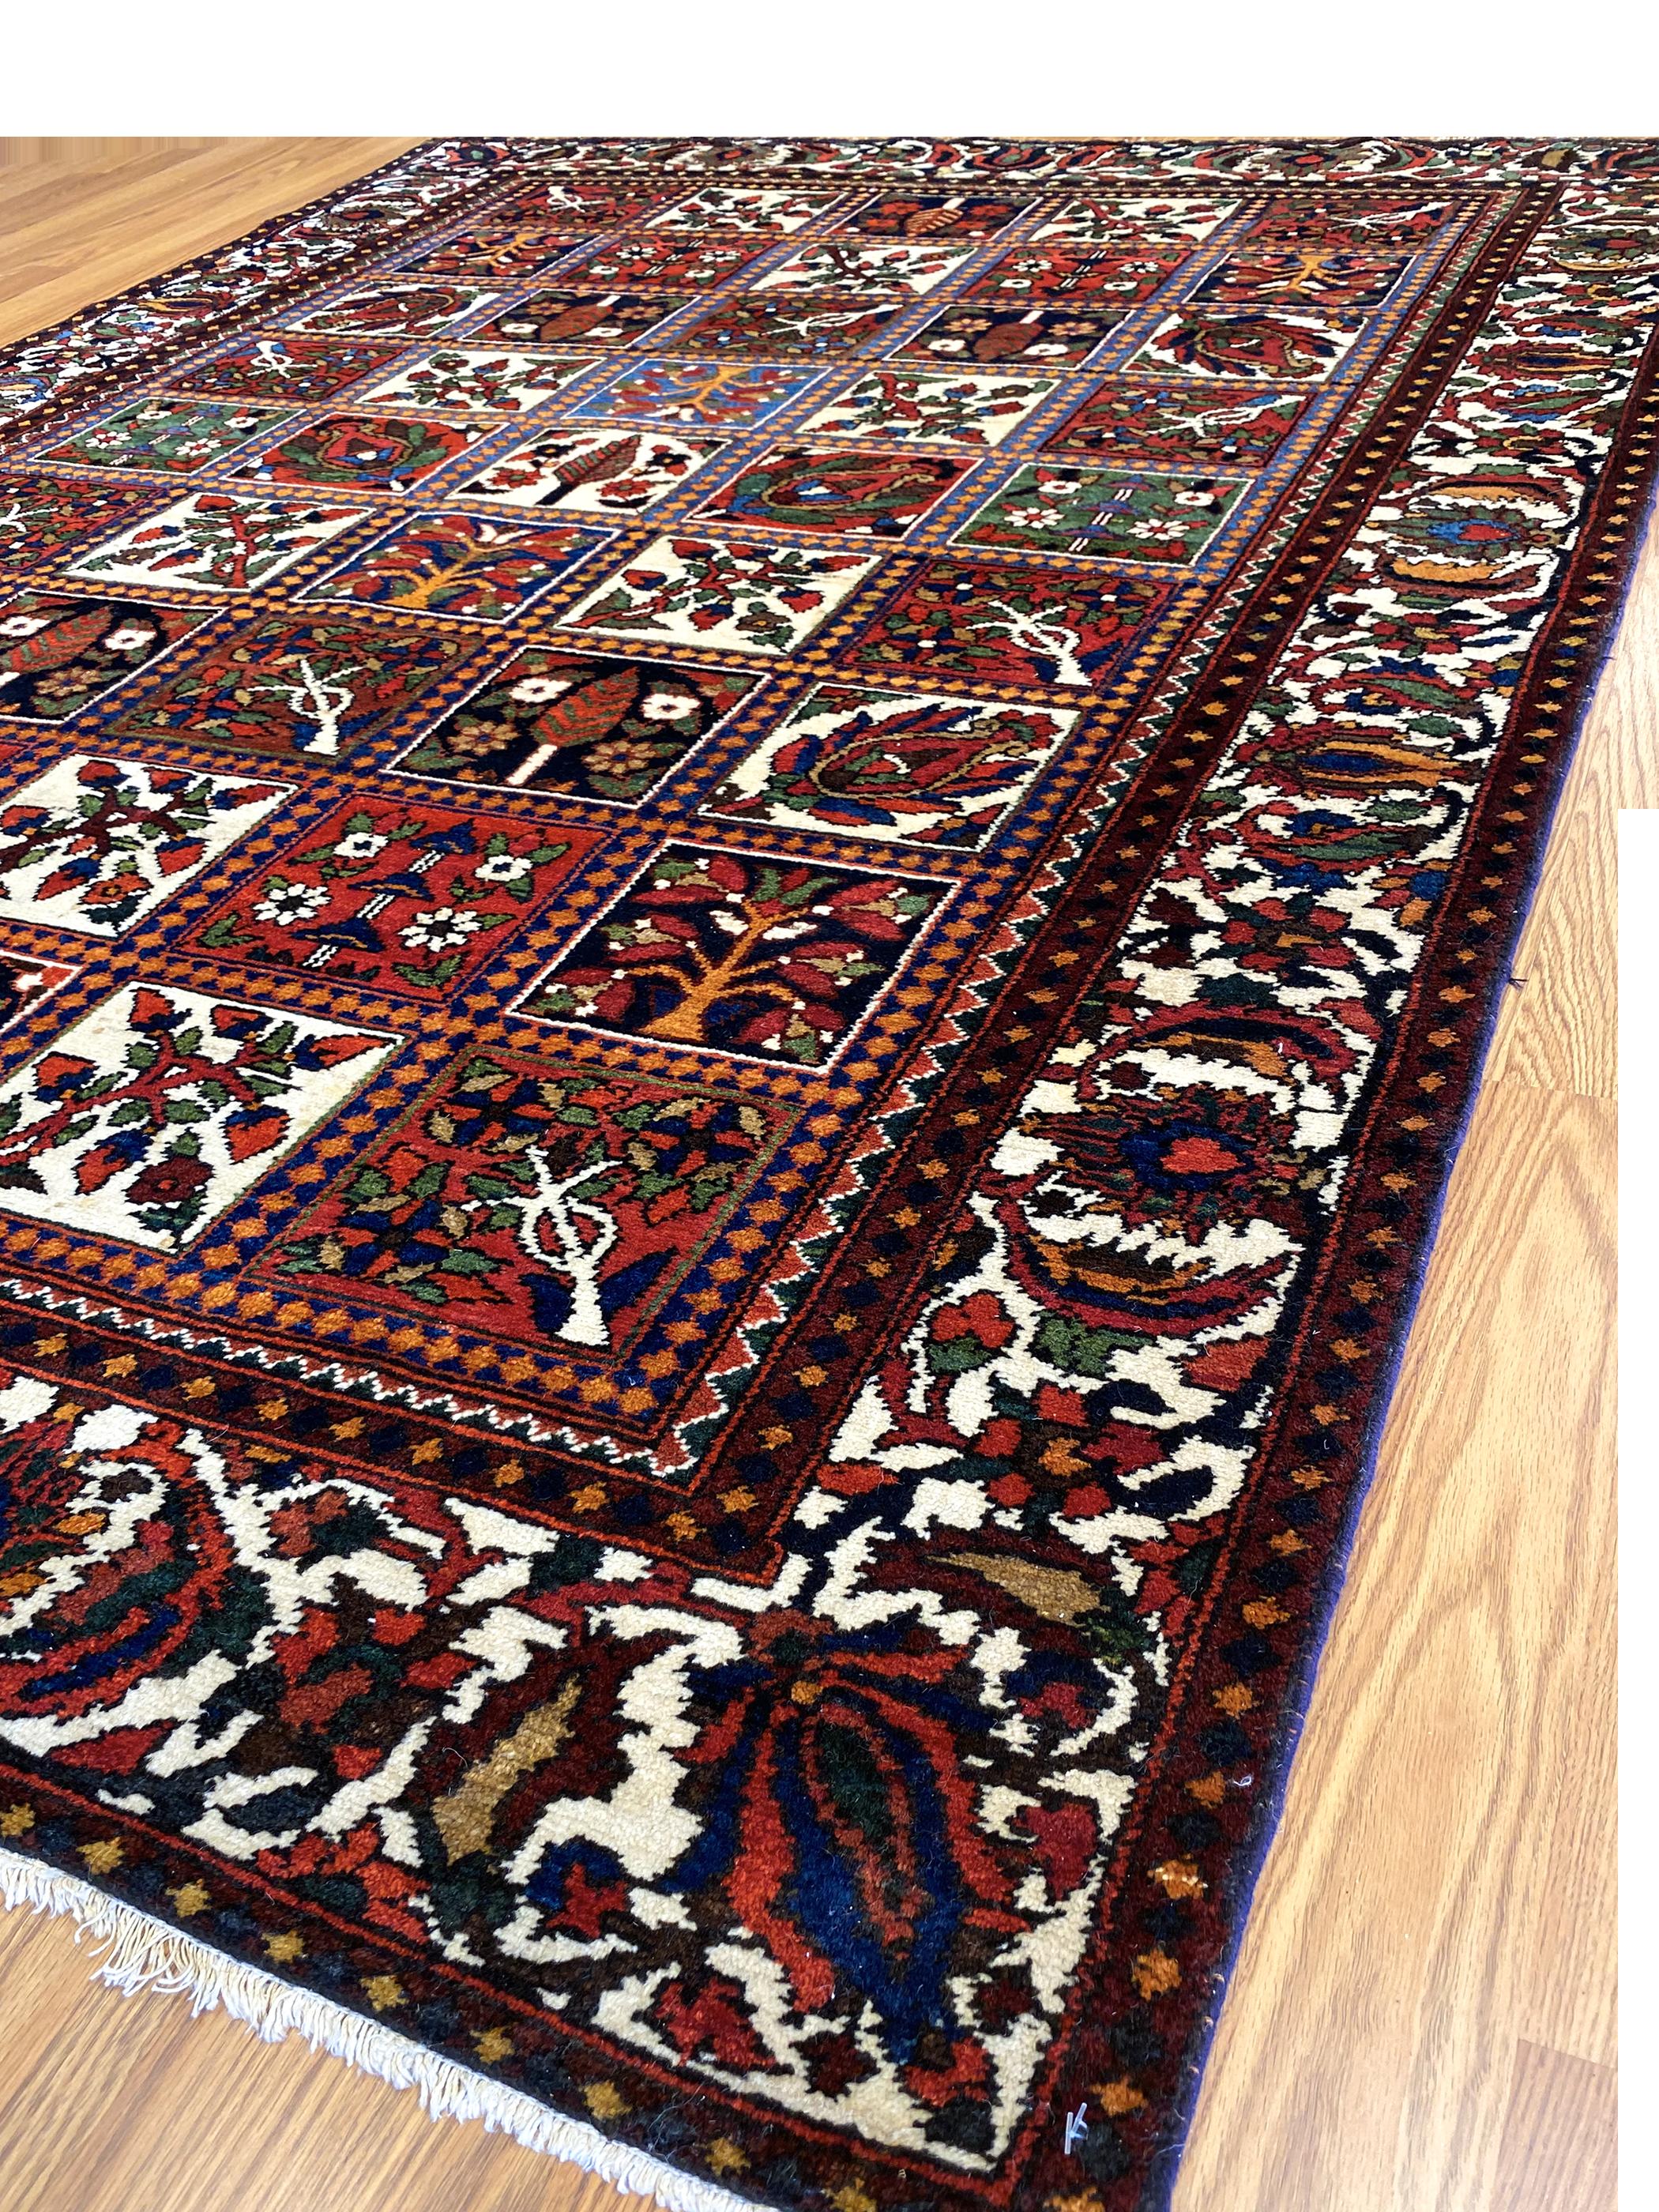 "Antique Persian Bakhtiari 4' 8"" x 6' 10"" Handmade Wool Area Rug - Shabahang Royal Carpet"